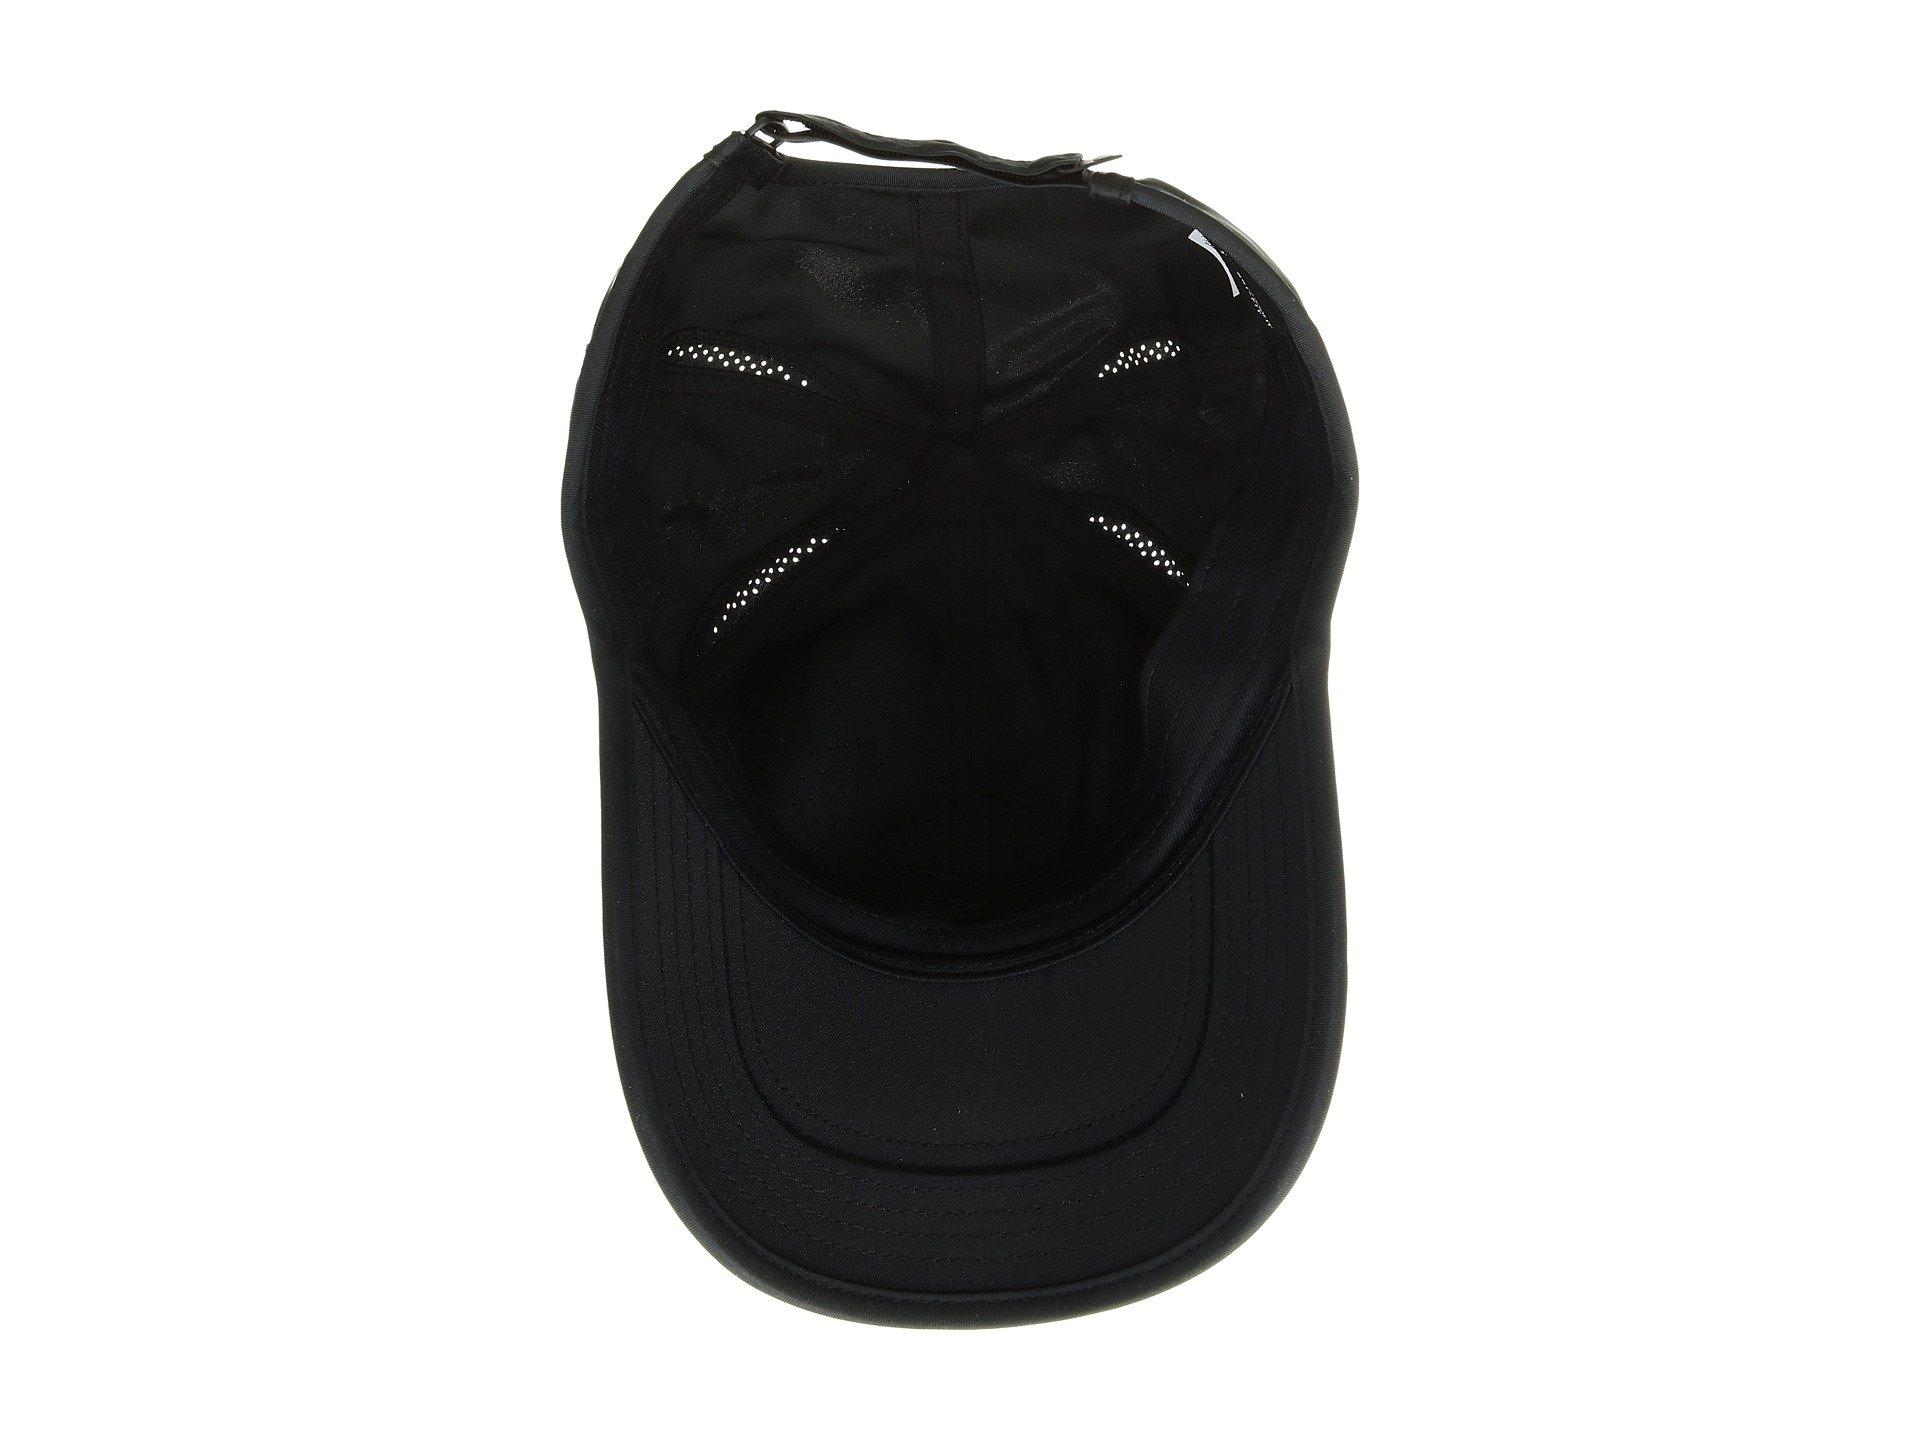 Nike Unisex Court AeroBill Featherlight Tennis Adjustable Cap Black/Black/Orange Peel (ONE Size) by NIKE (Image #4)